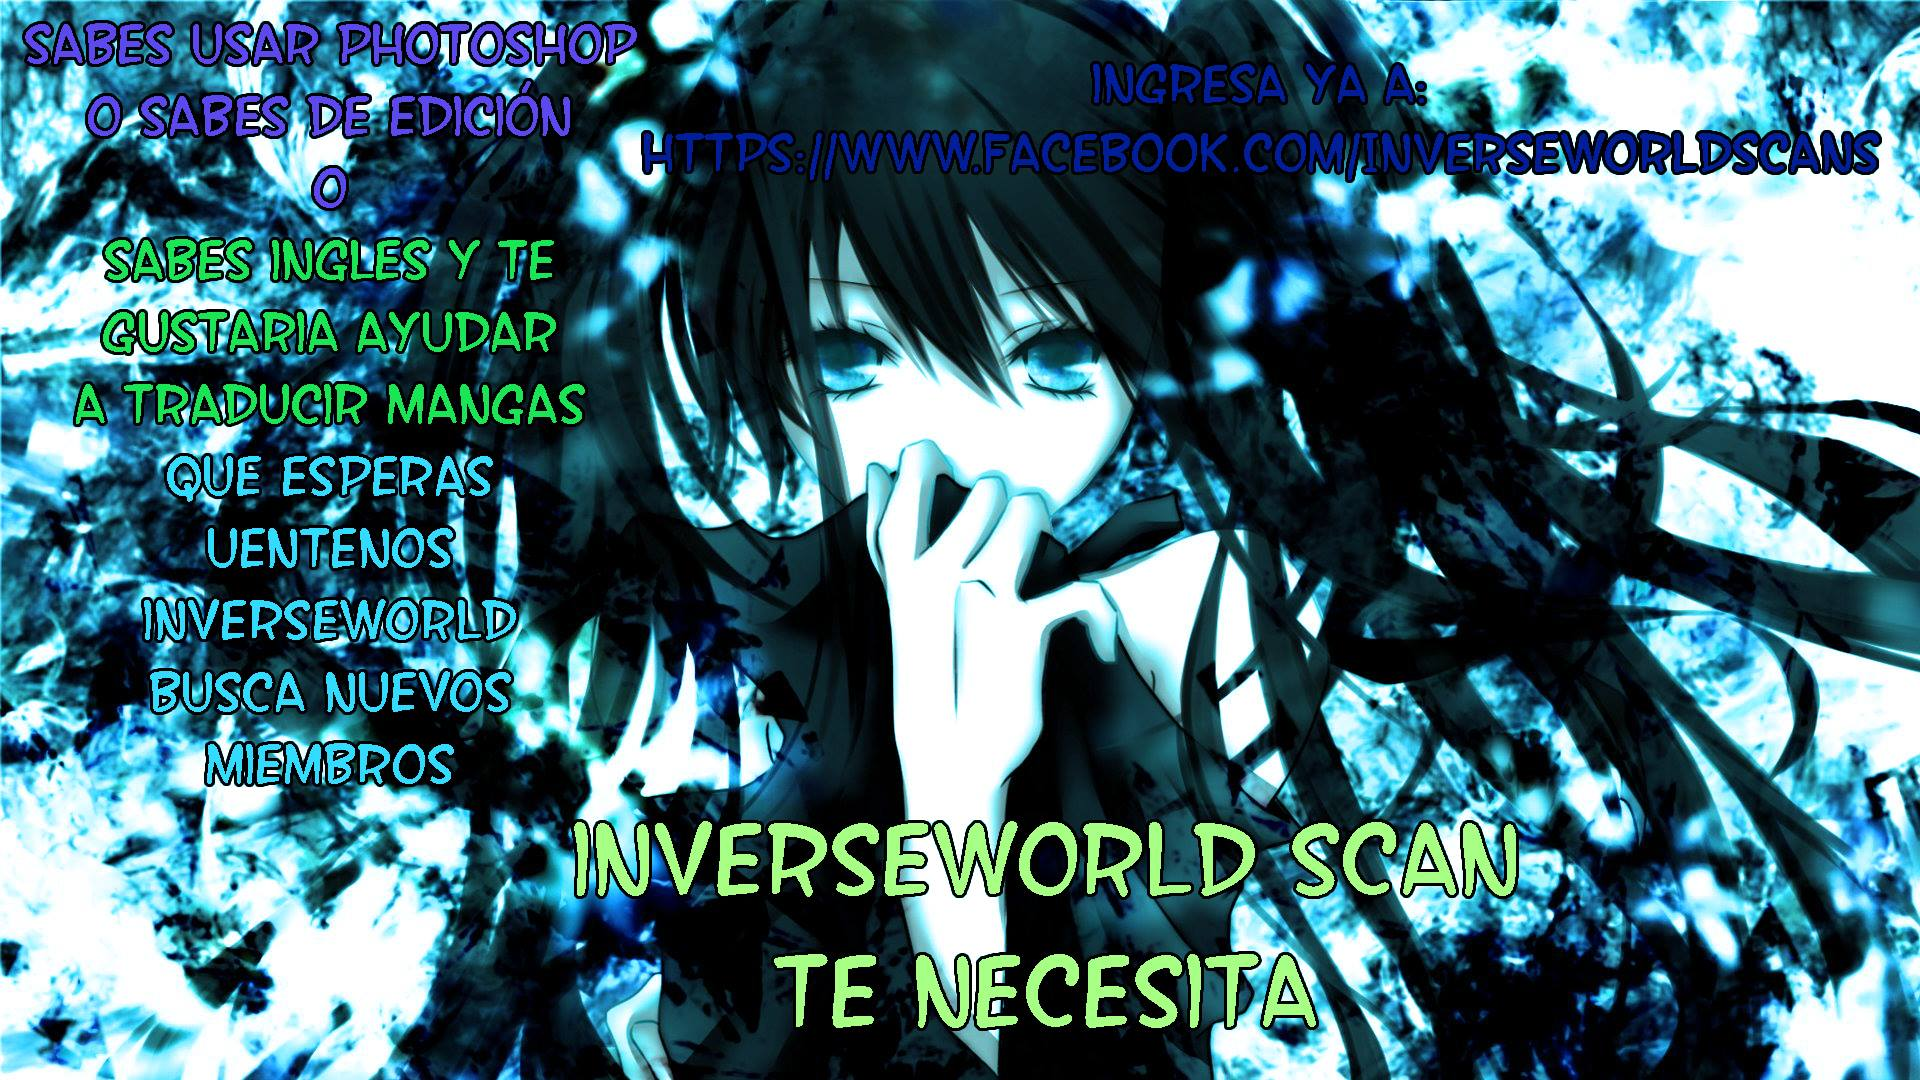 https://c5.mangatag.com/es_manga/18/16210/415311/71103463cca58f868394462cc92e854d.jpg Page 1